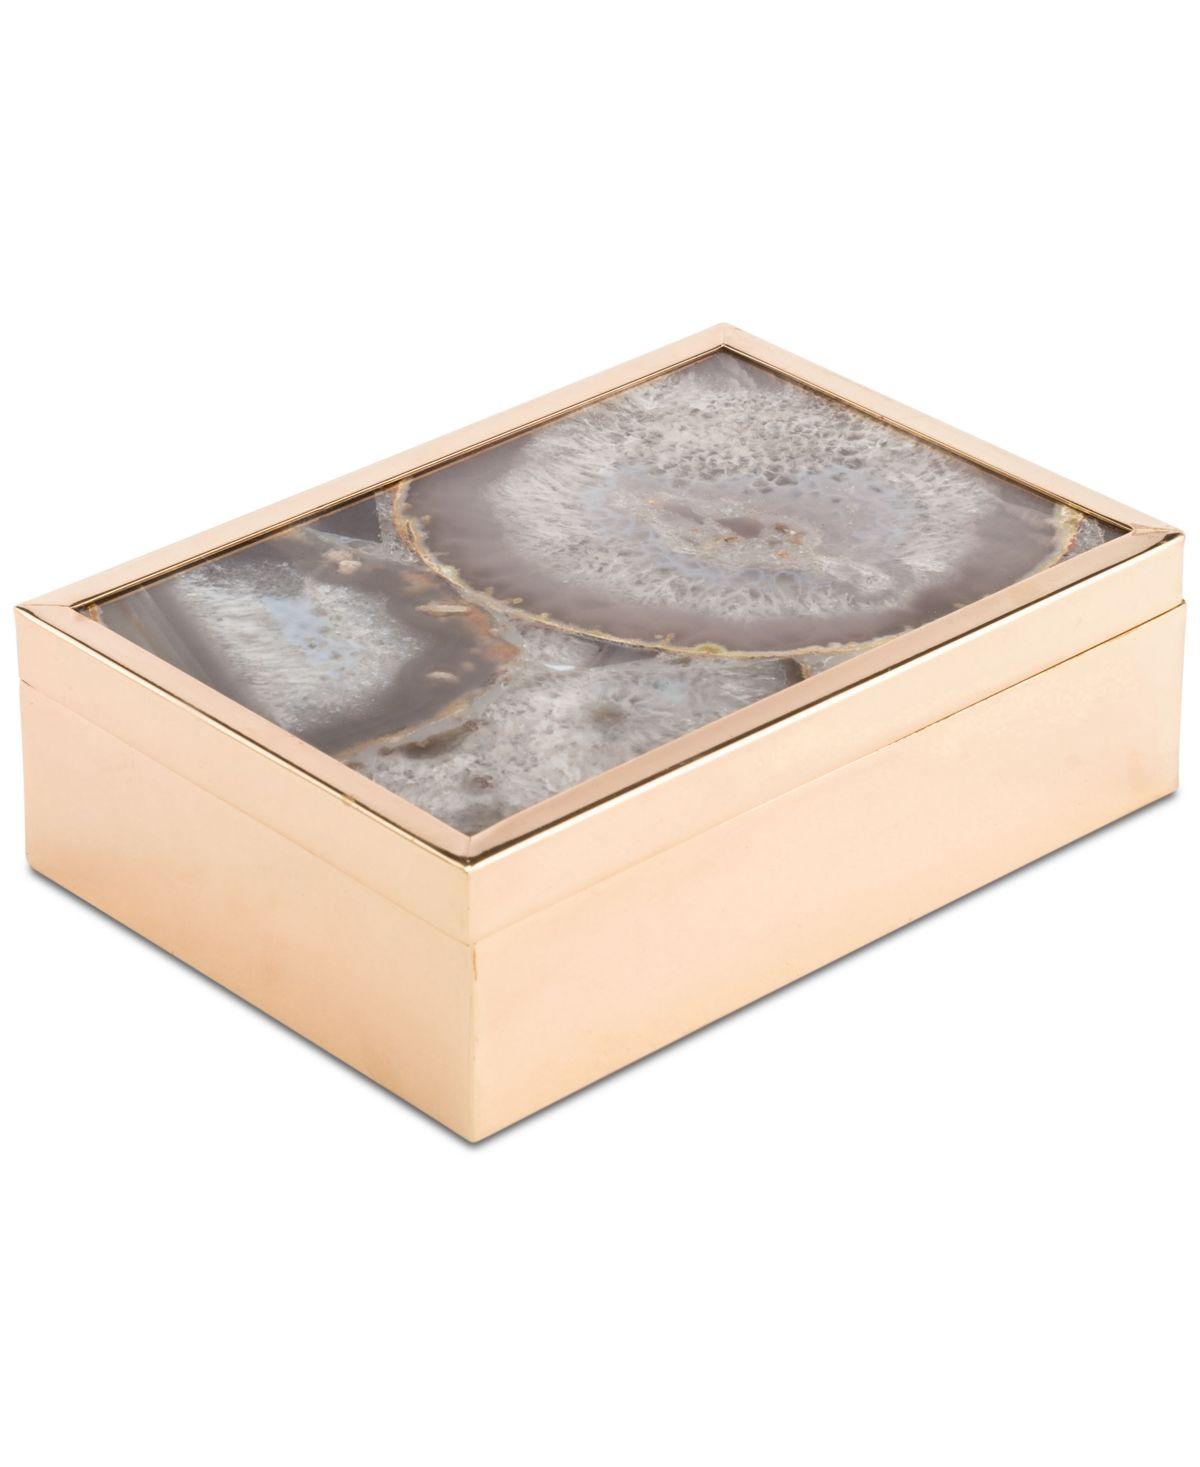 Zuo White Stone Large Decorative Box Reviews Macy S